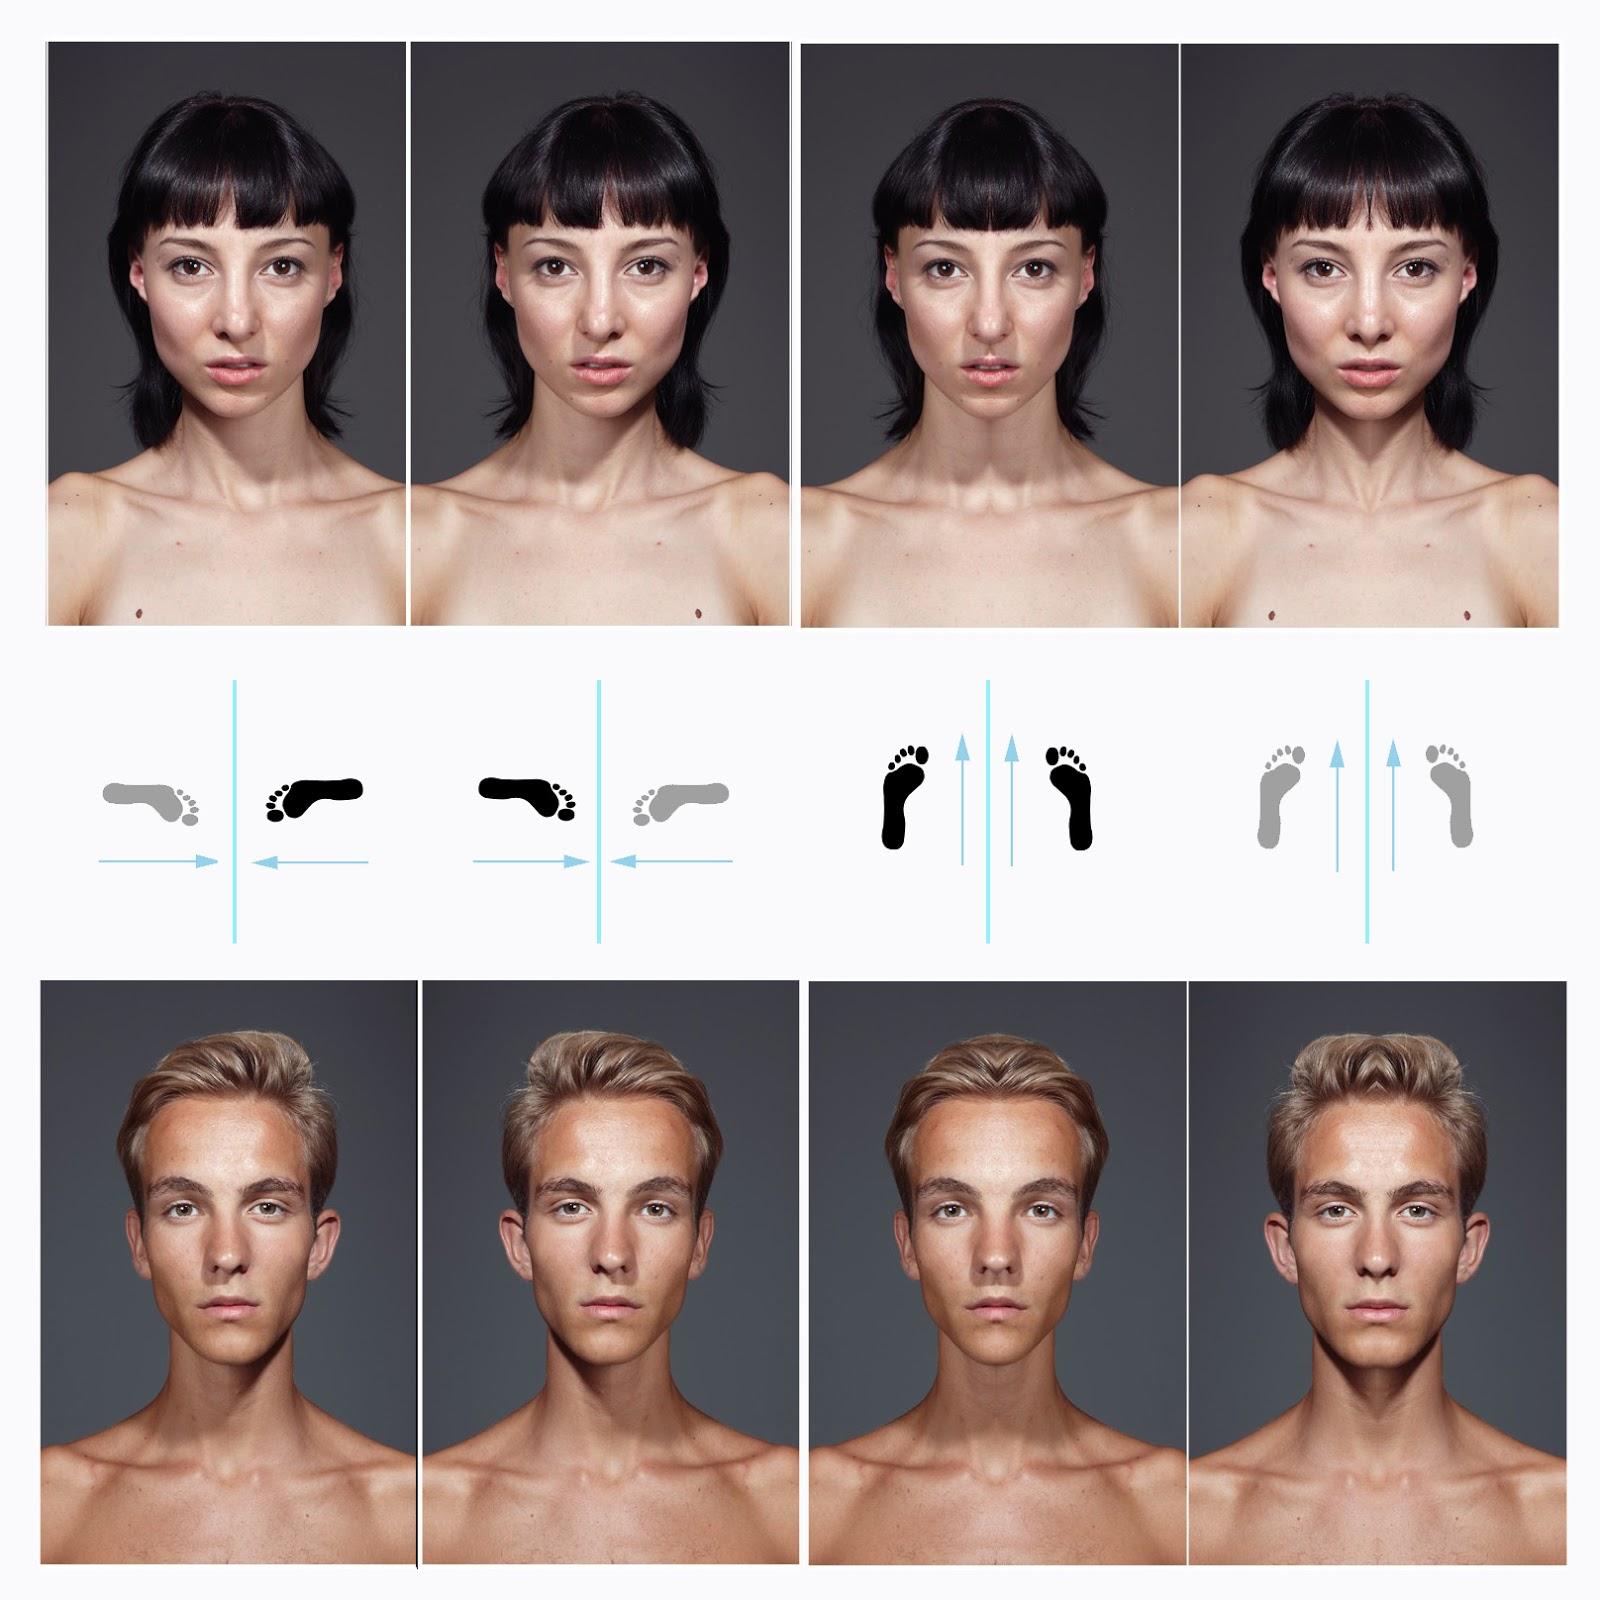 rostros, variaciones, simetrias